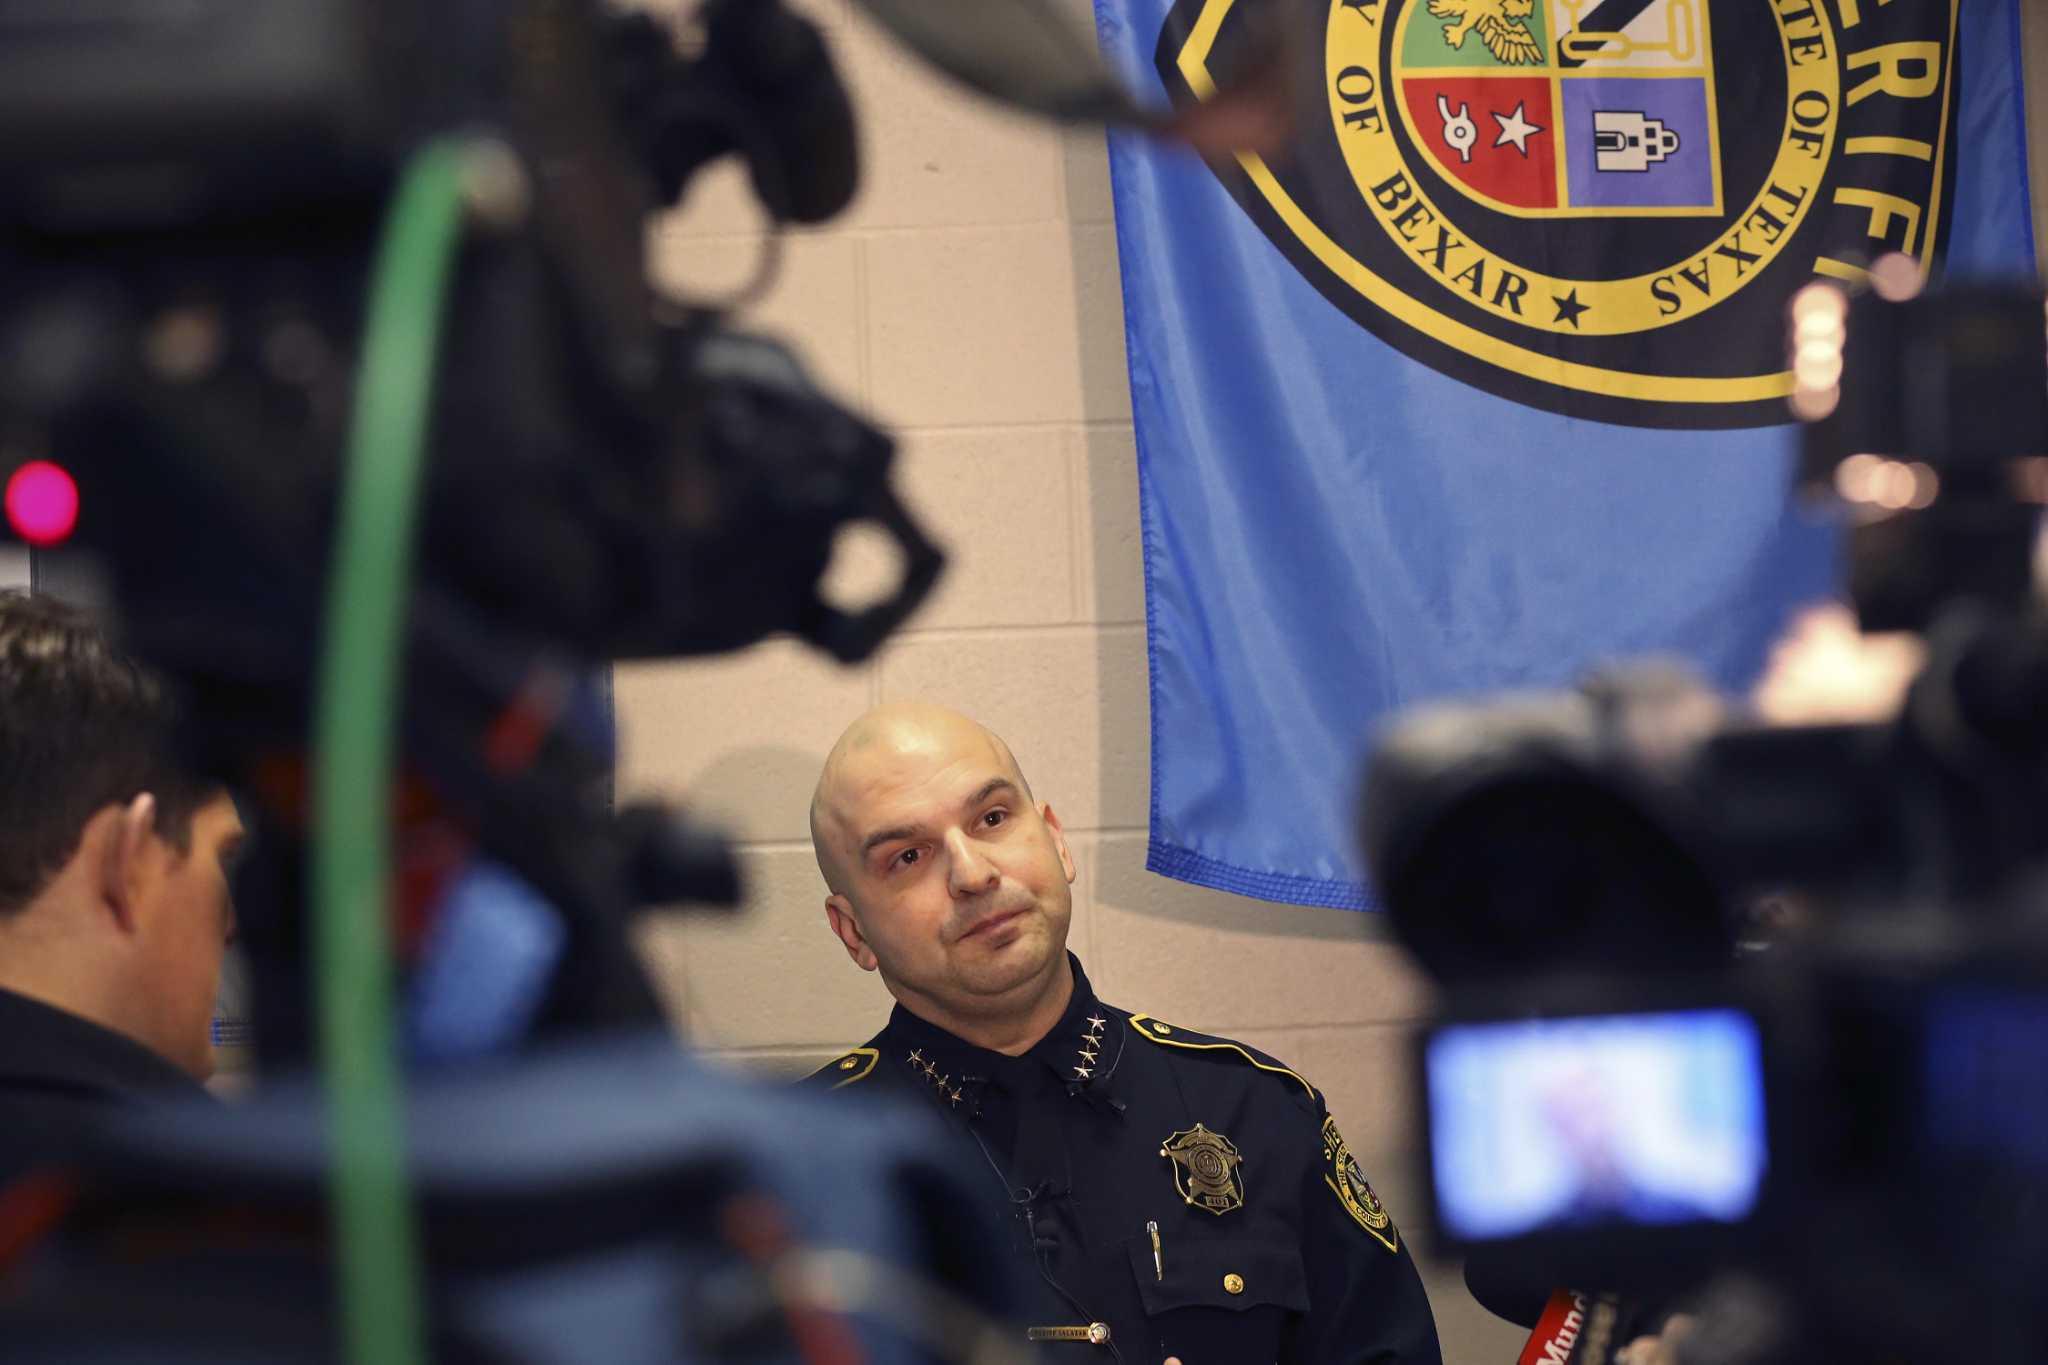 Bexar County Sheriff's Office begins 'new era of training' - San Antonio  Express-News